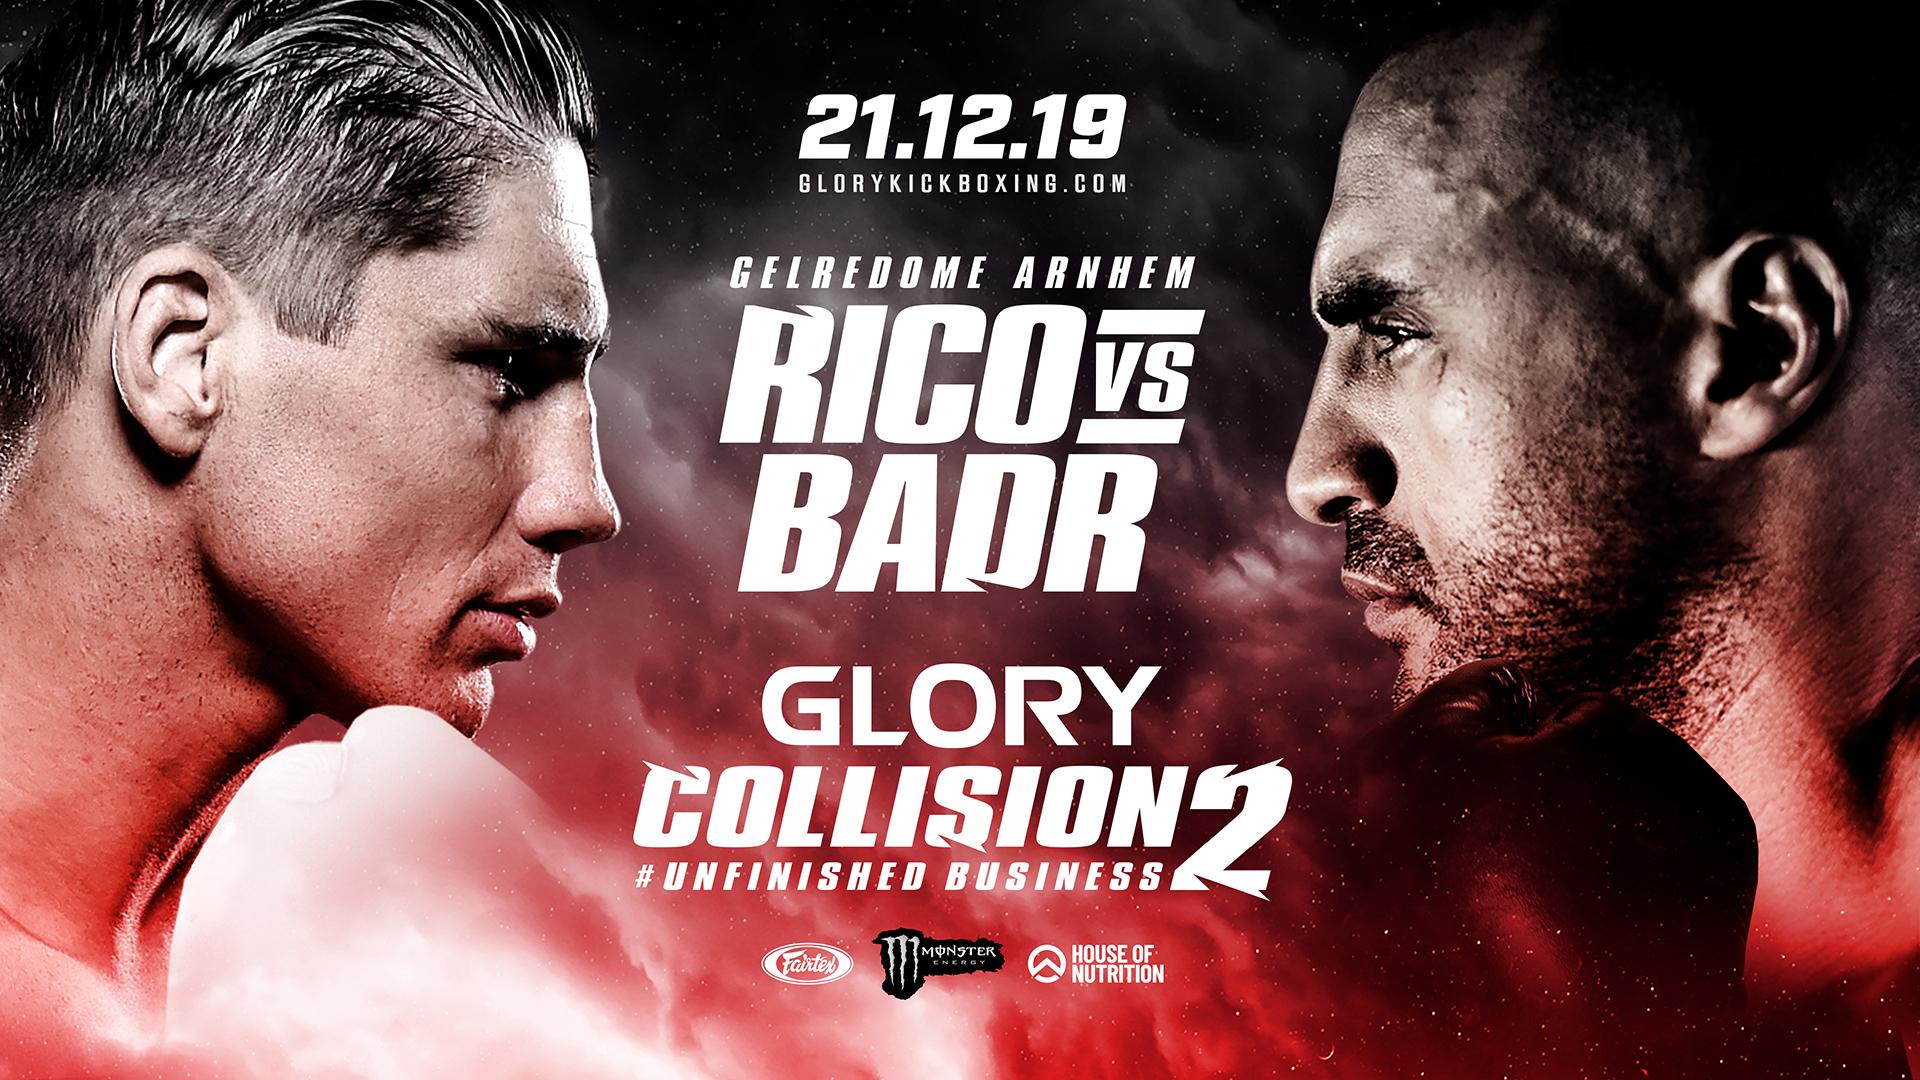 collision 2 glory kickboxing